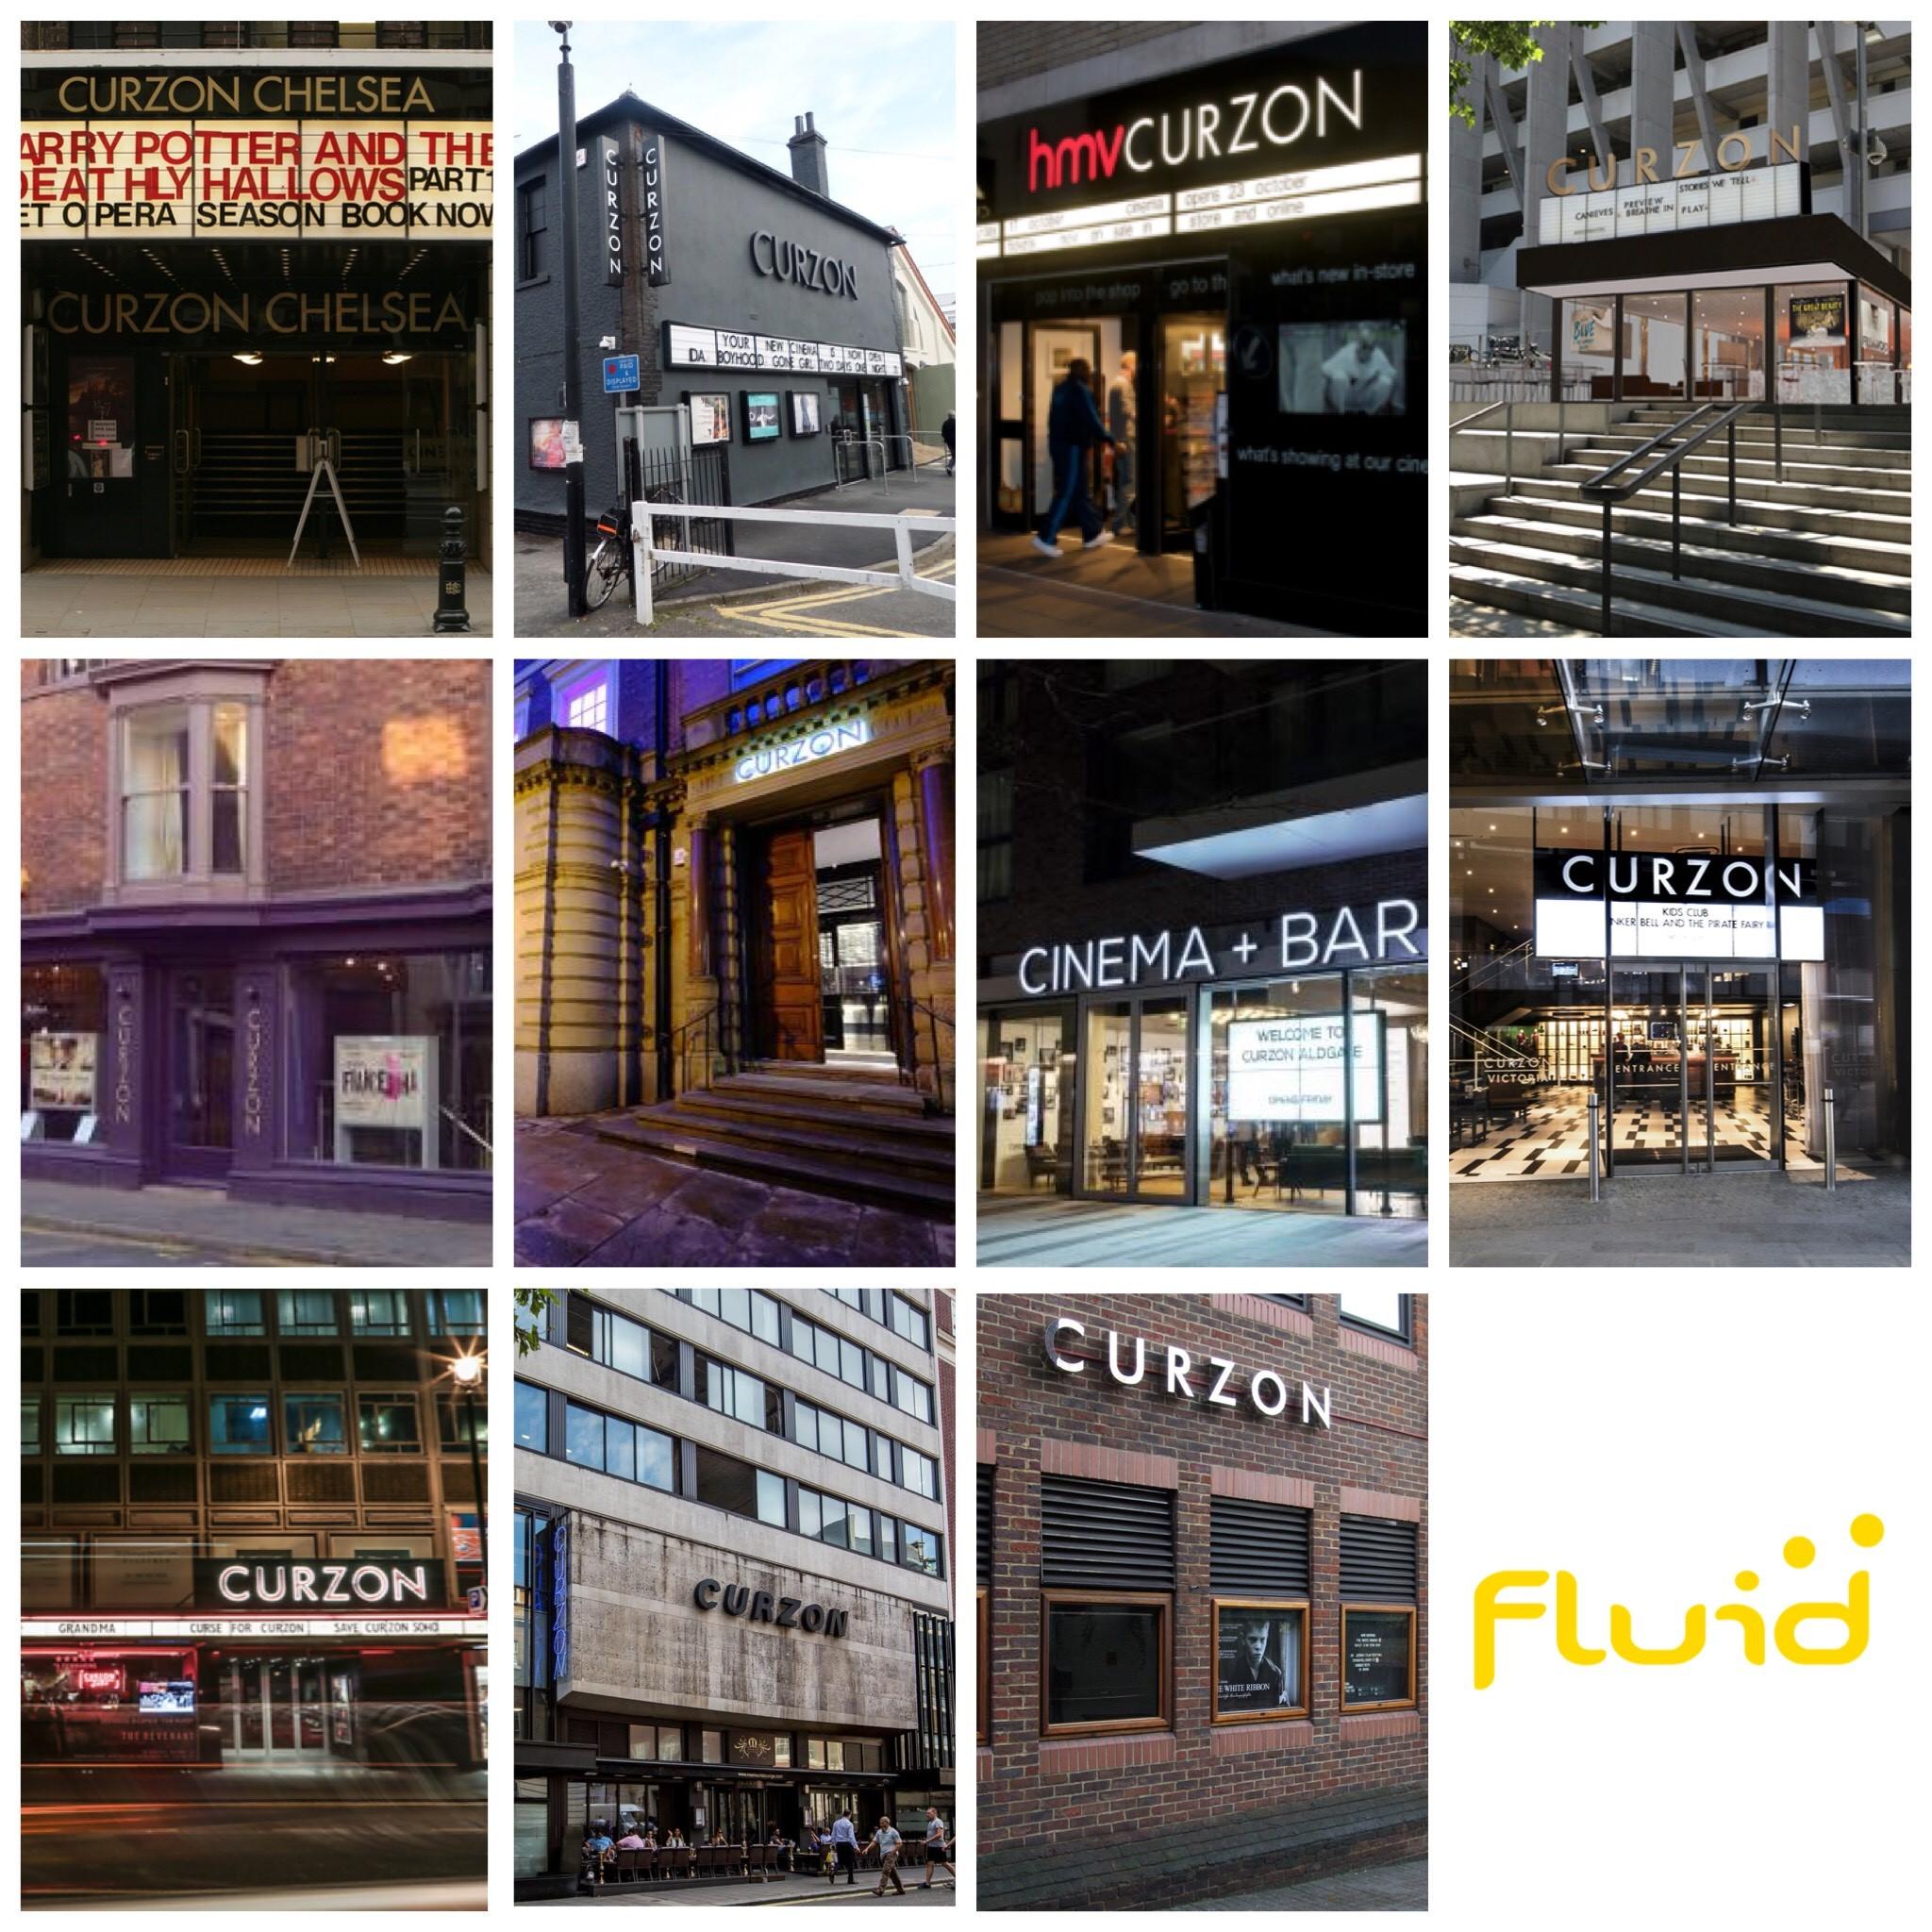 Curzon_cinemas.jpg